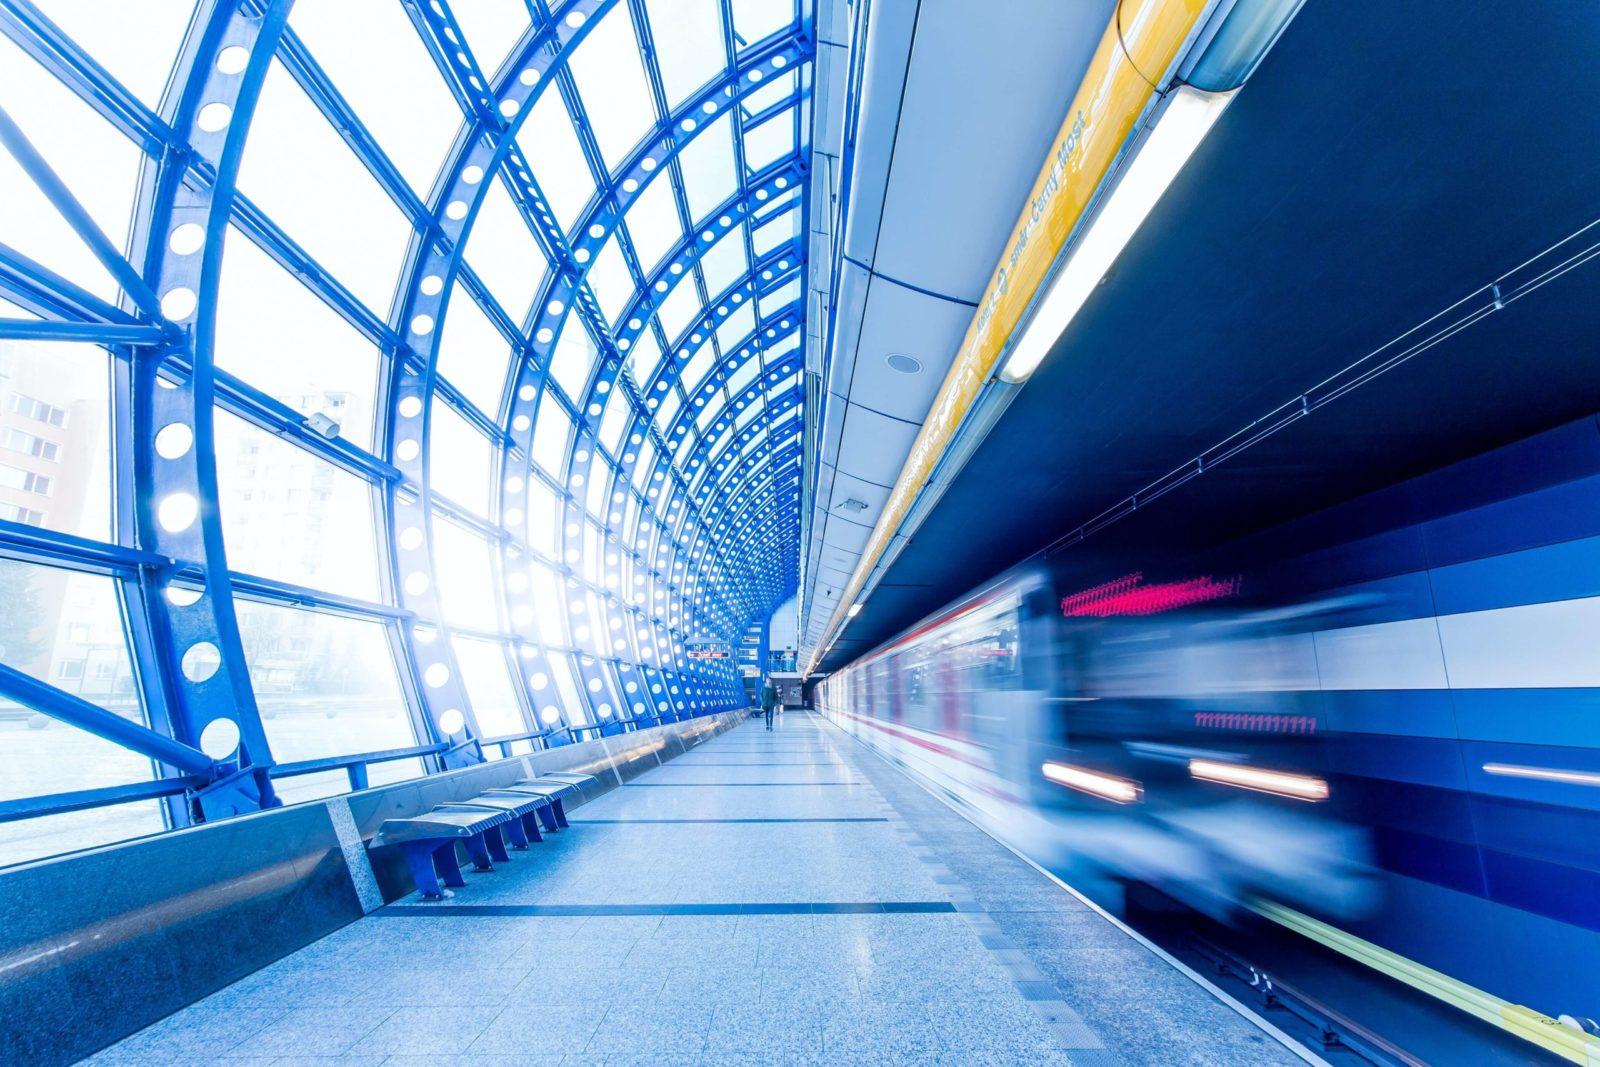 secteur ferroviaire expertise